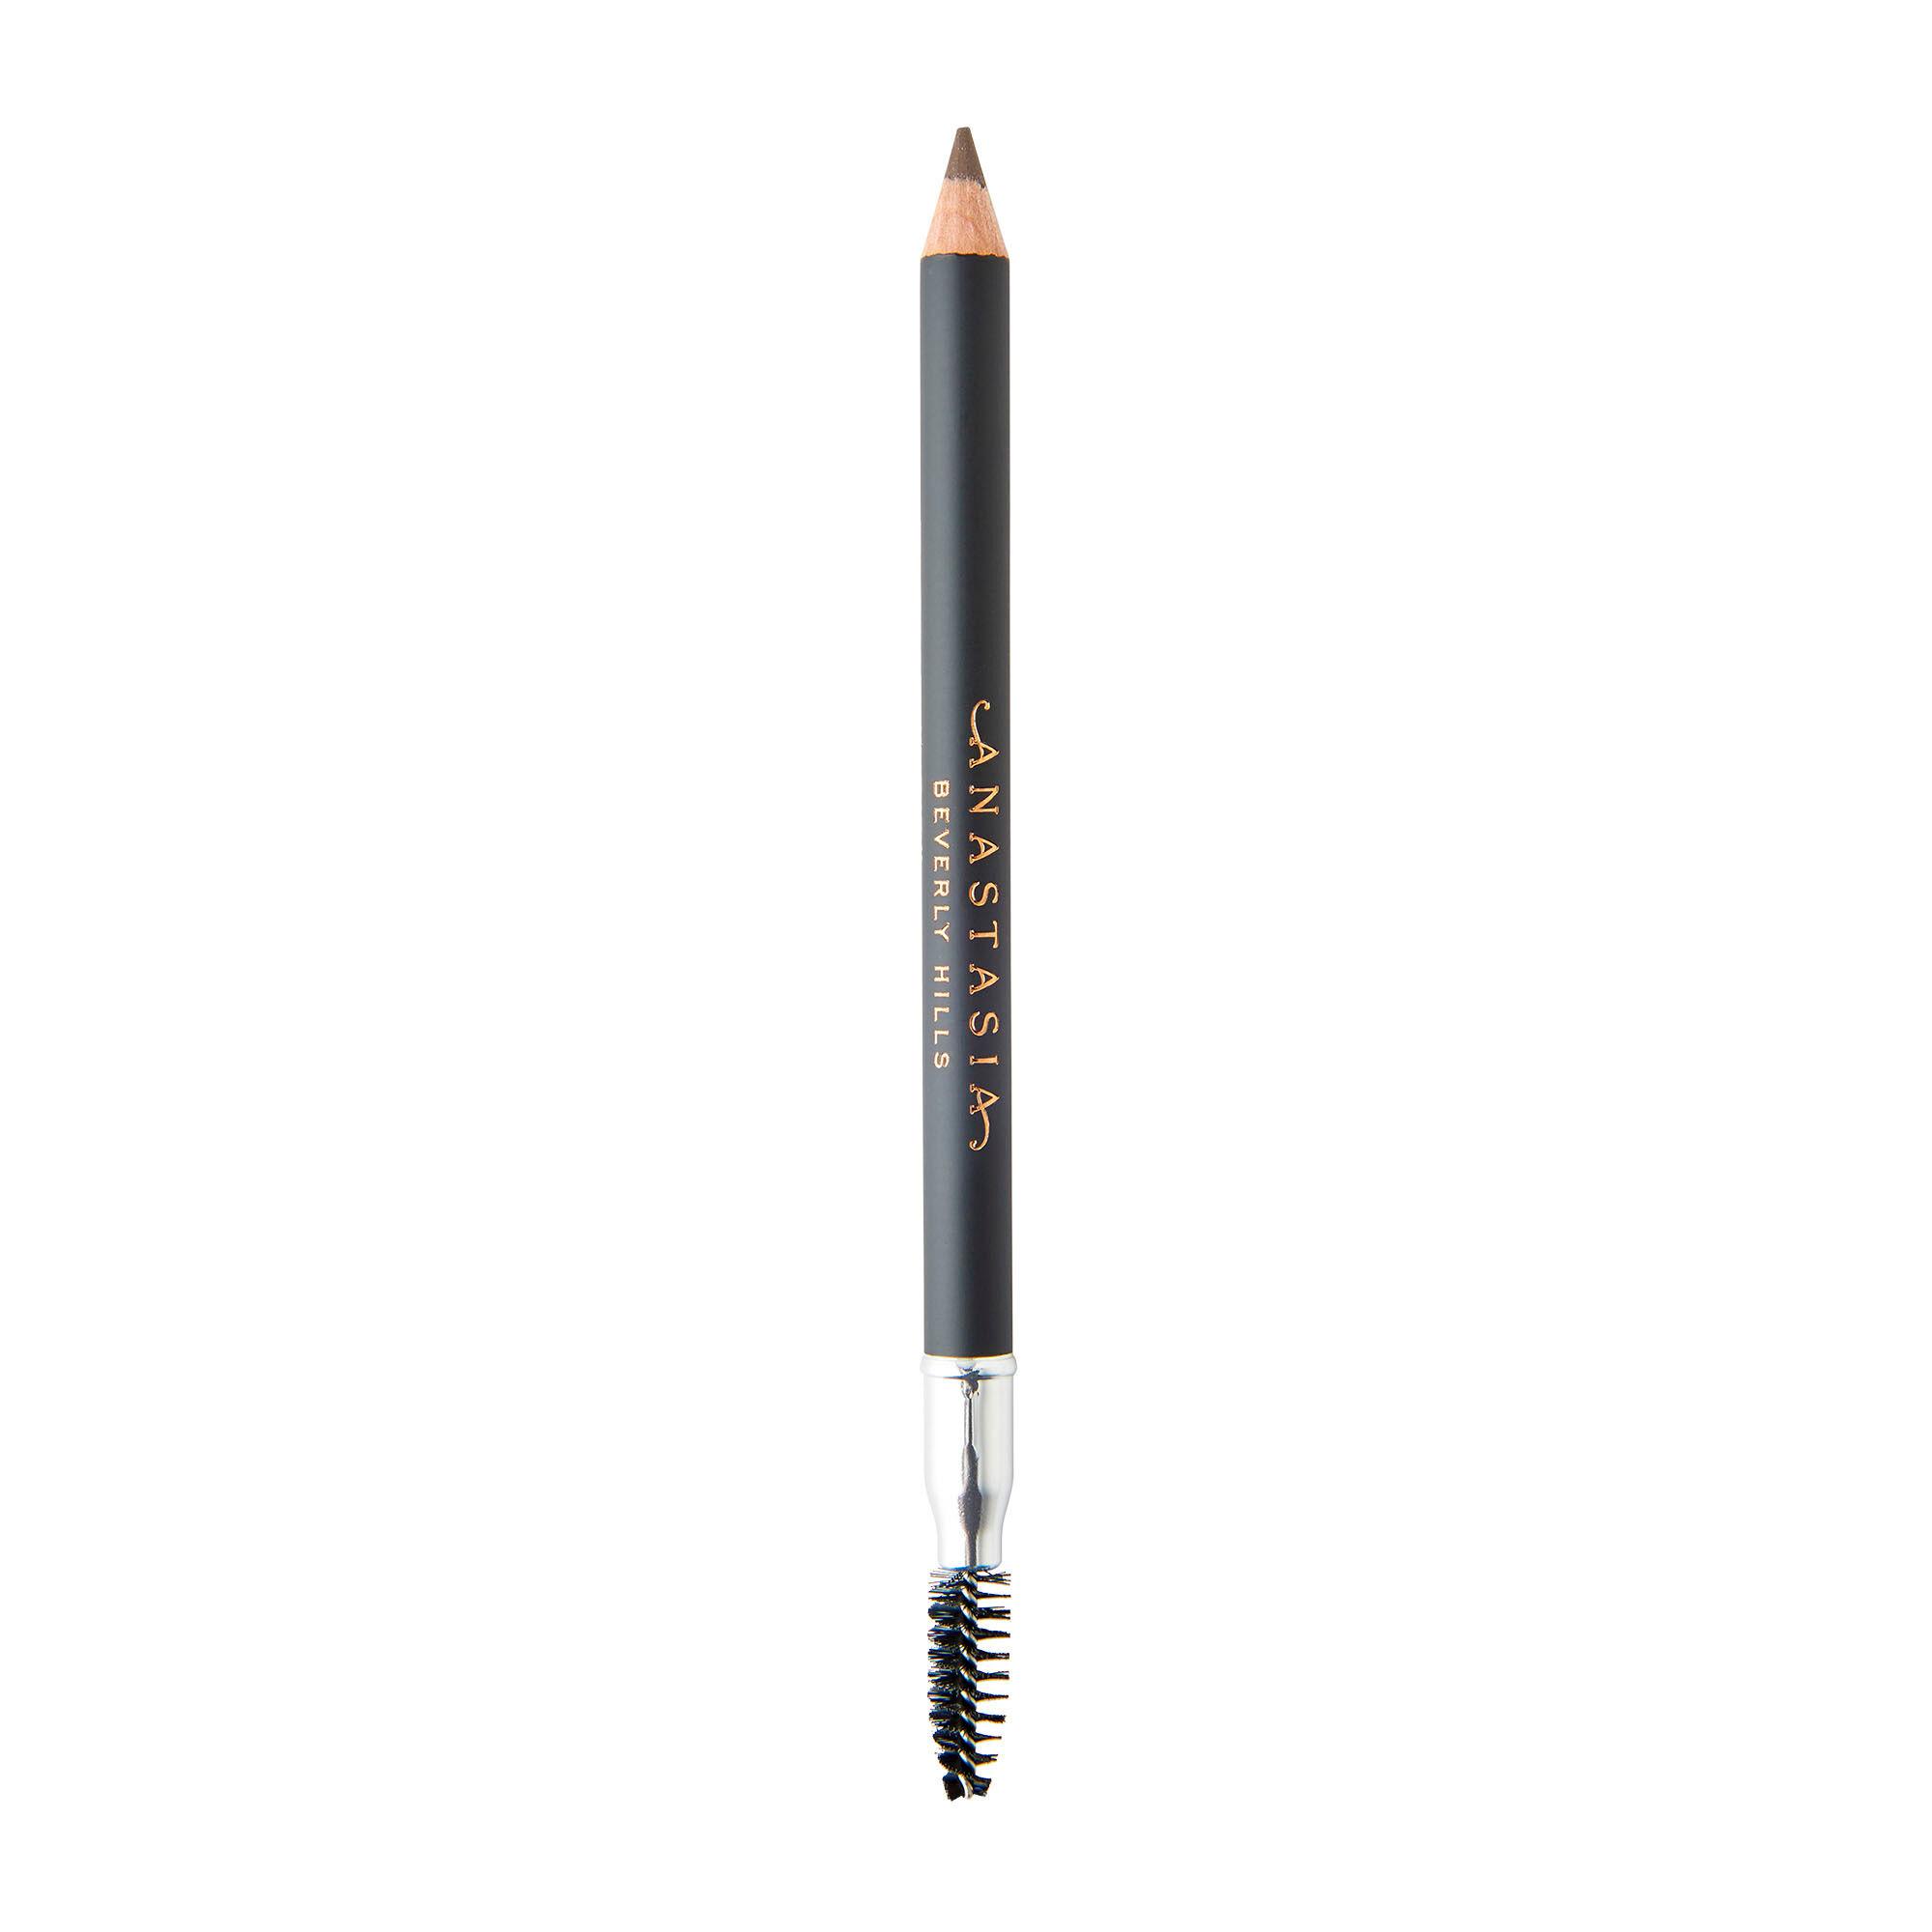 Anastasia Beverly Hills Crayon Perfect Brow Pencil Auburn Soft Brown 1.05g